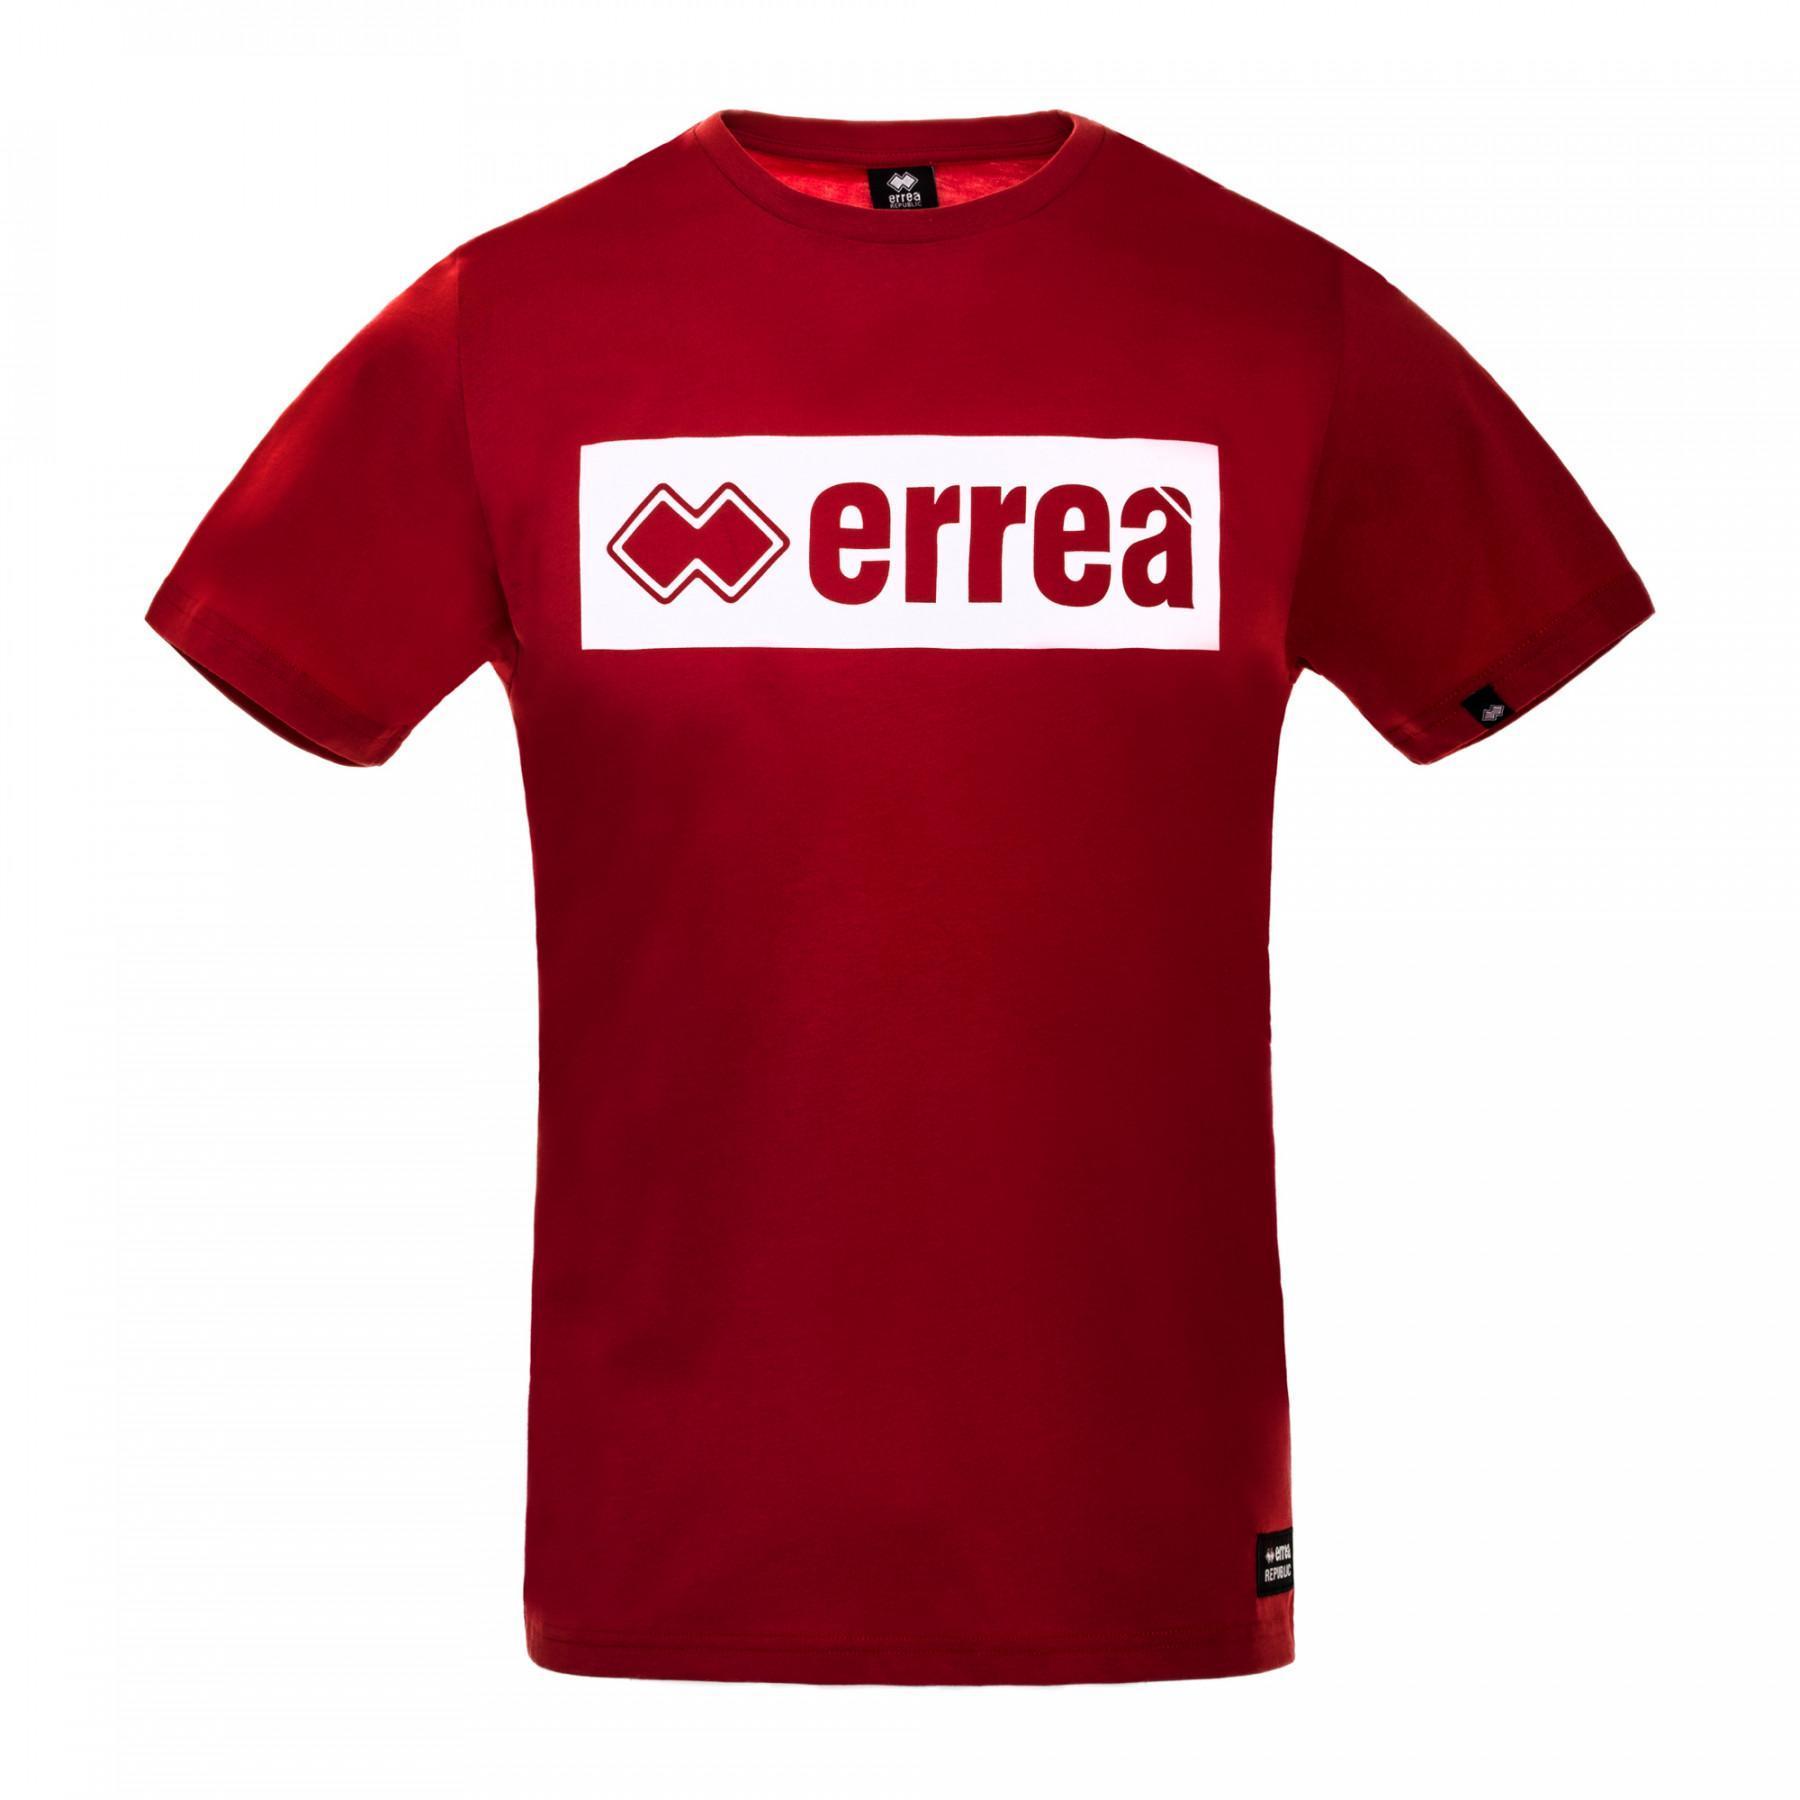 T-shirt Errea essential logo ad